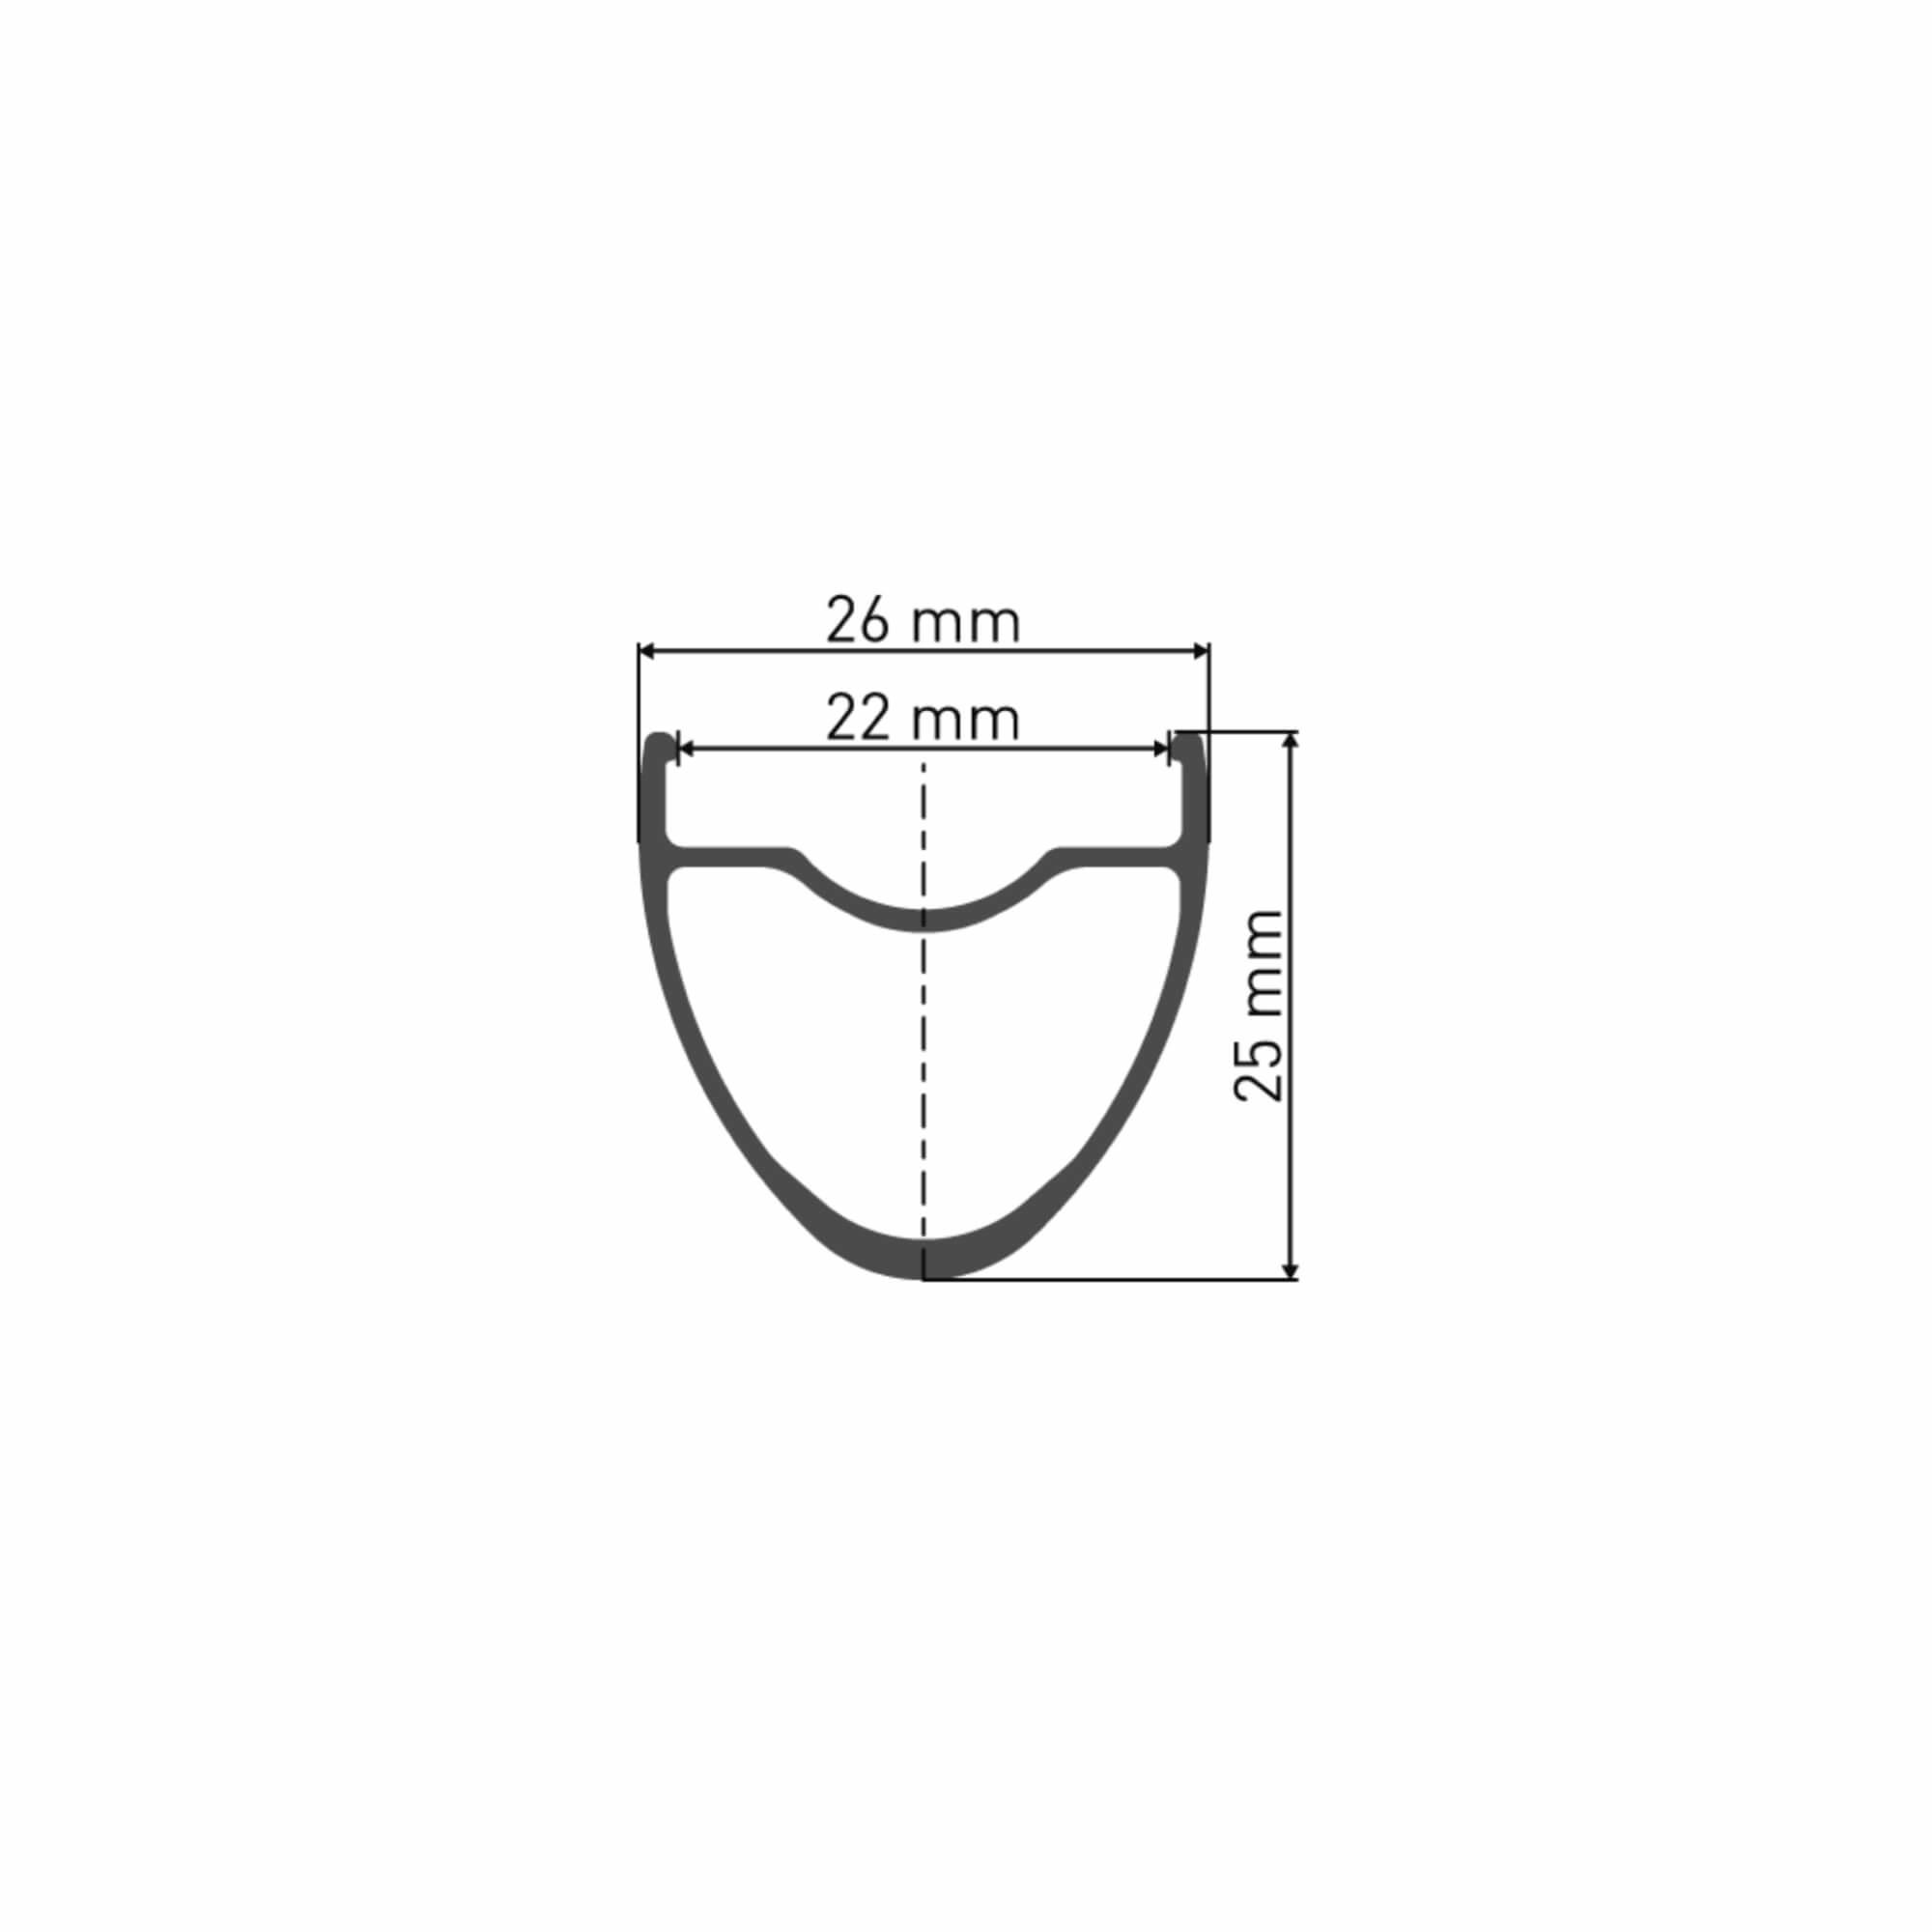 CR1400 Dicut 25 Disc Wheelset Multiaxle-3